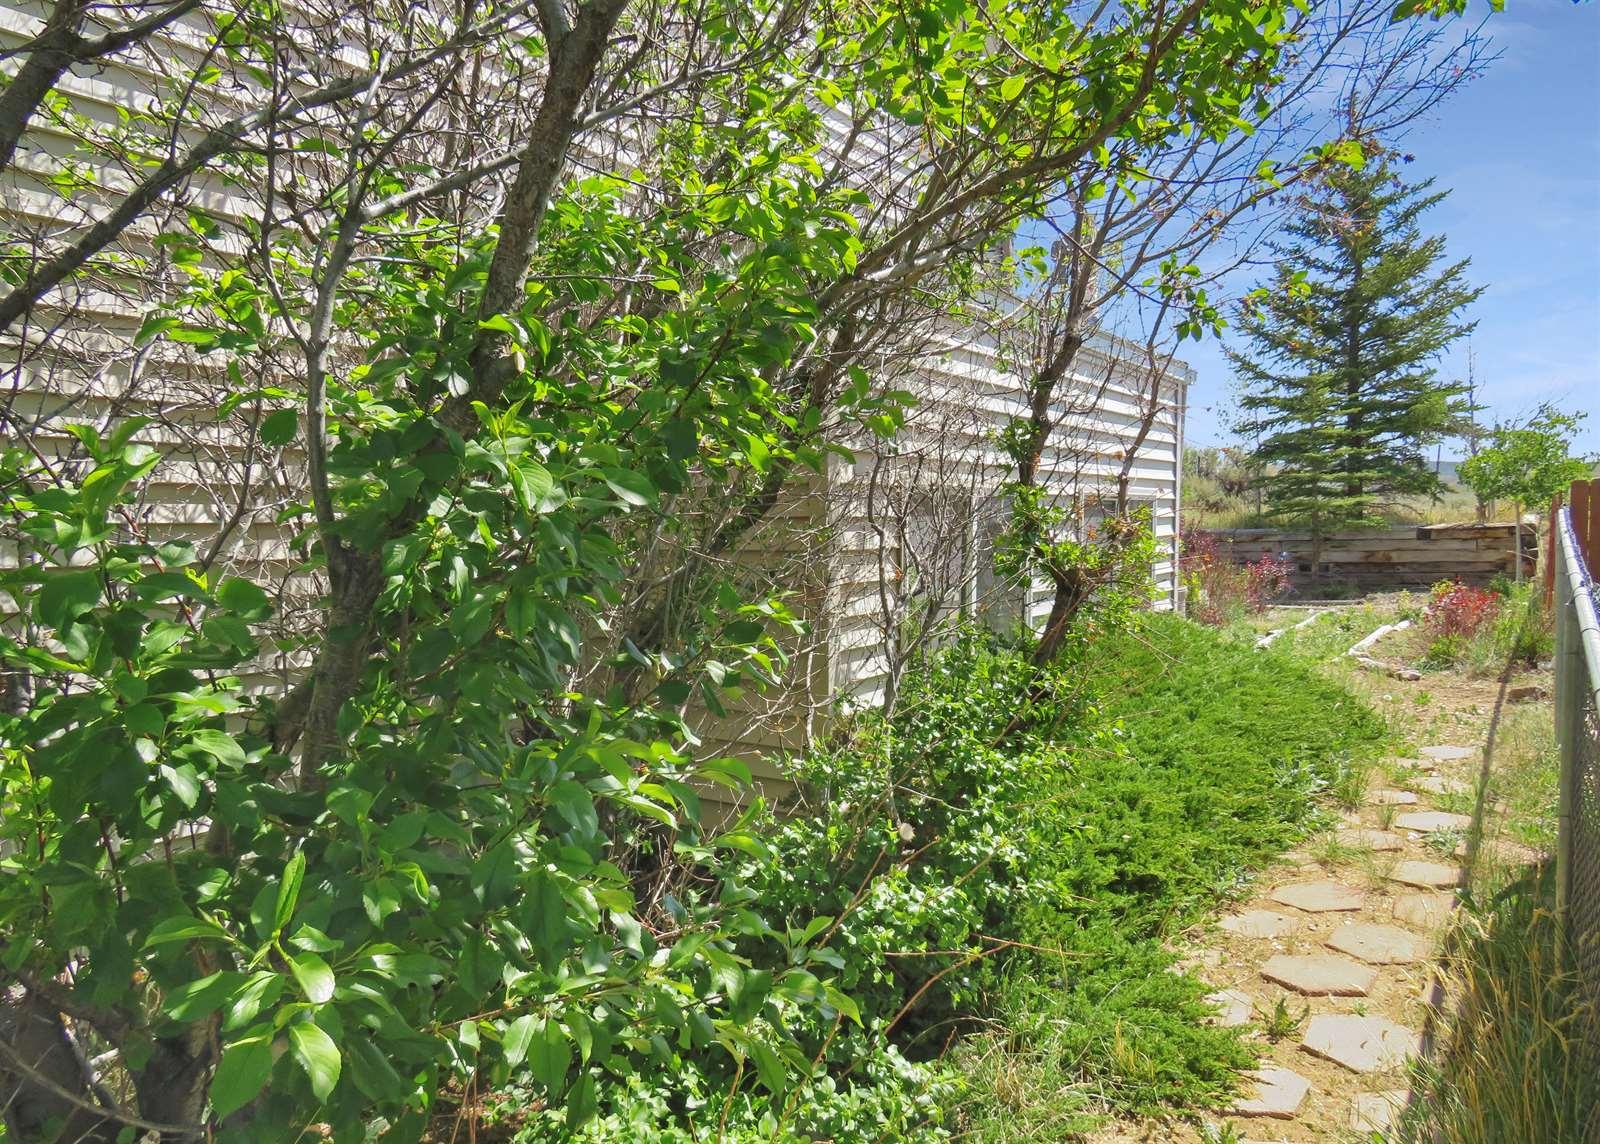 205 Granite, Evanston, WY 82930